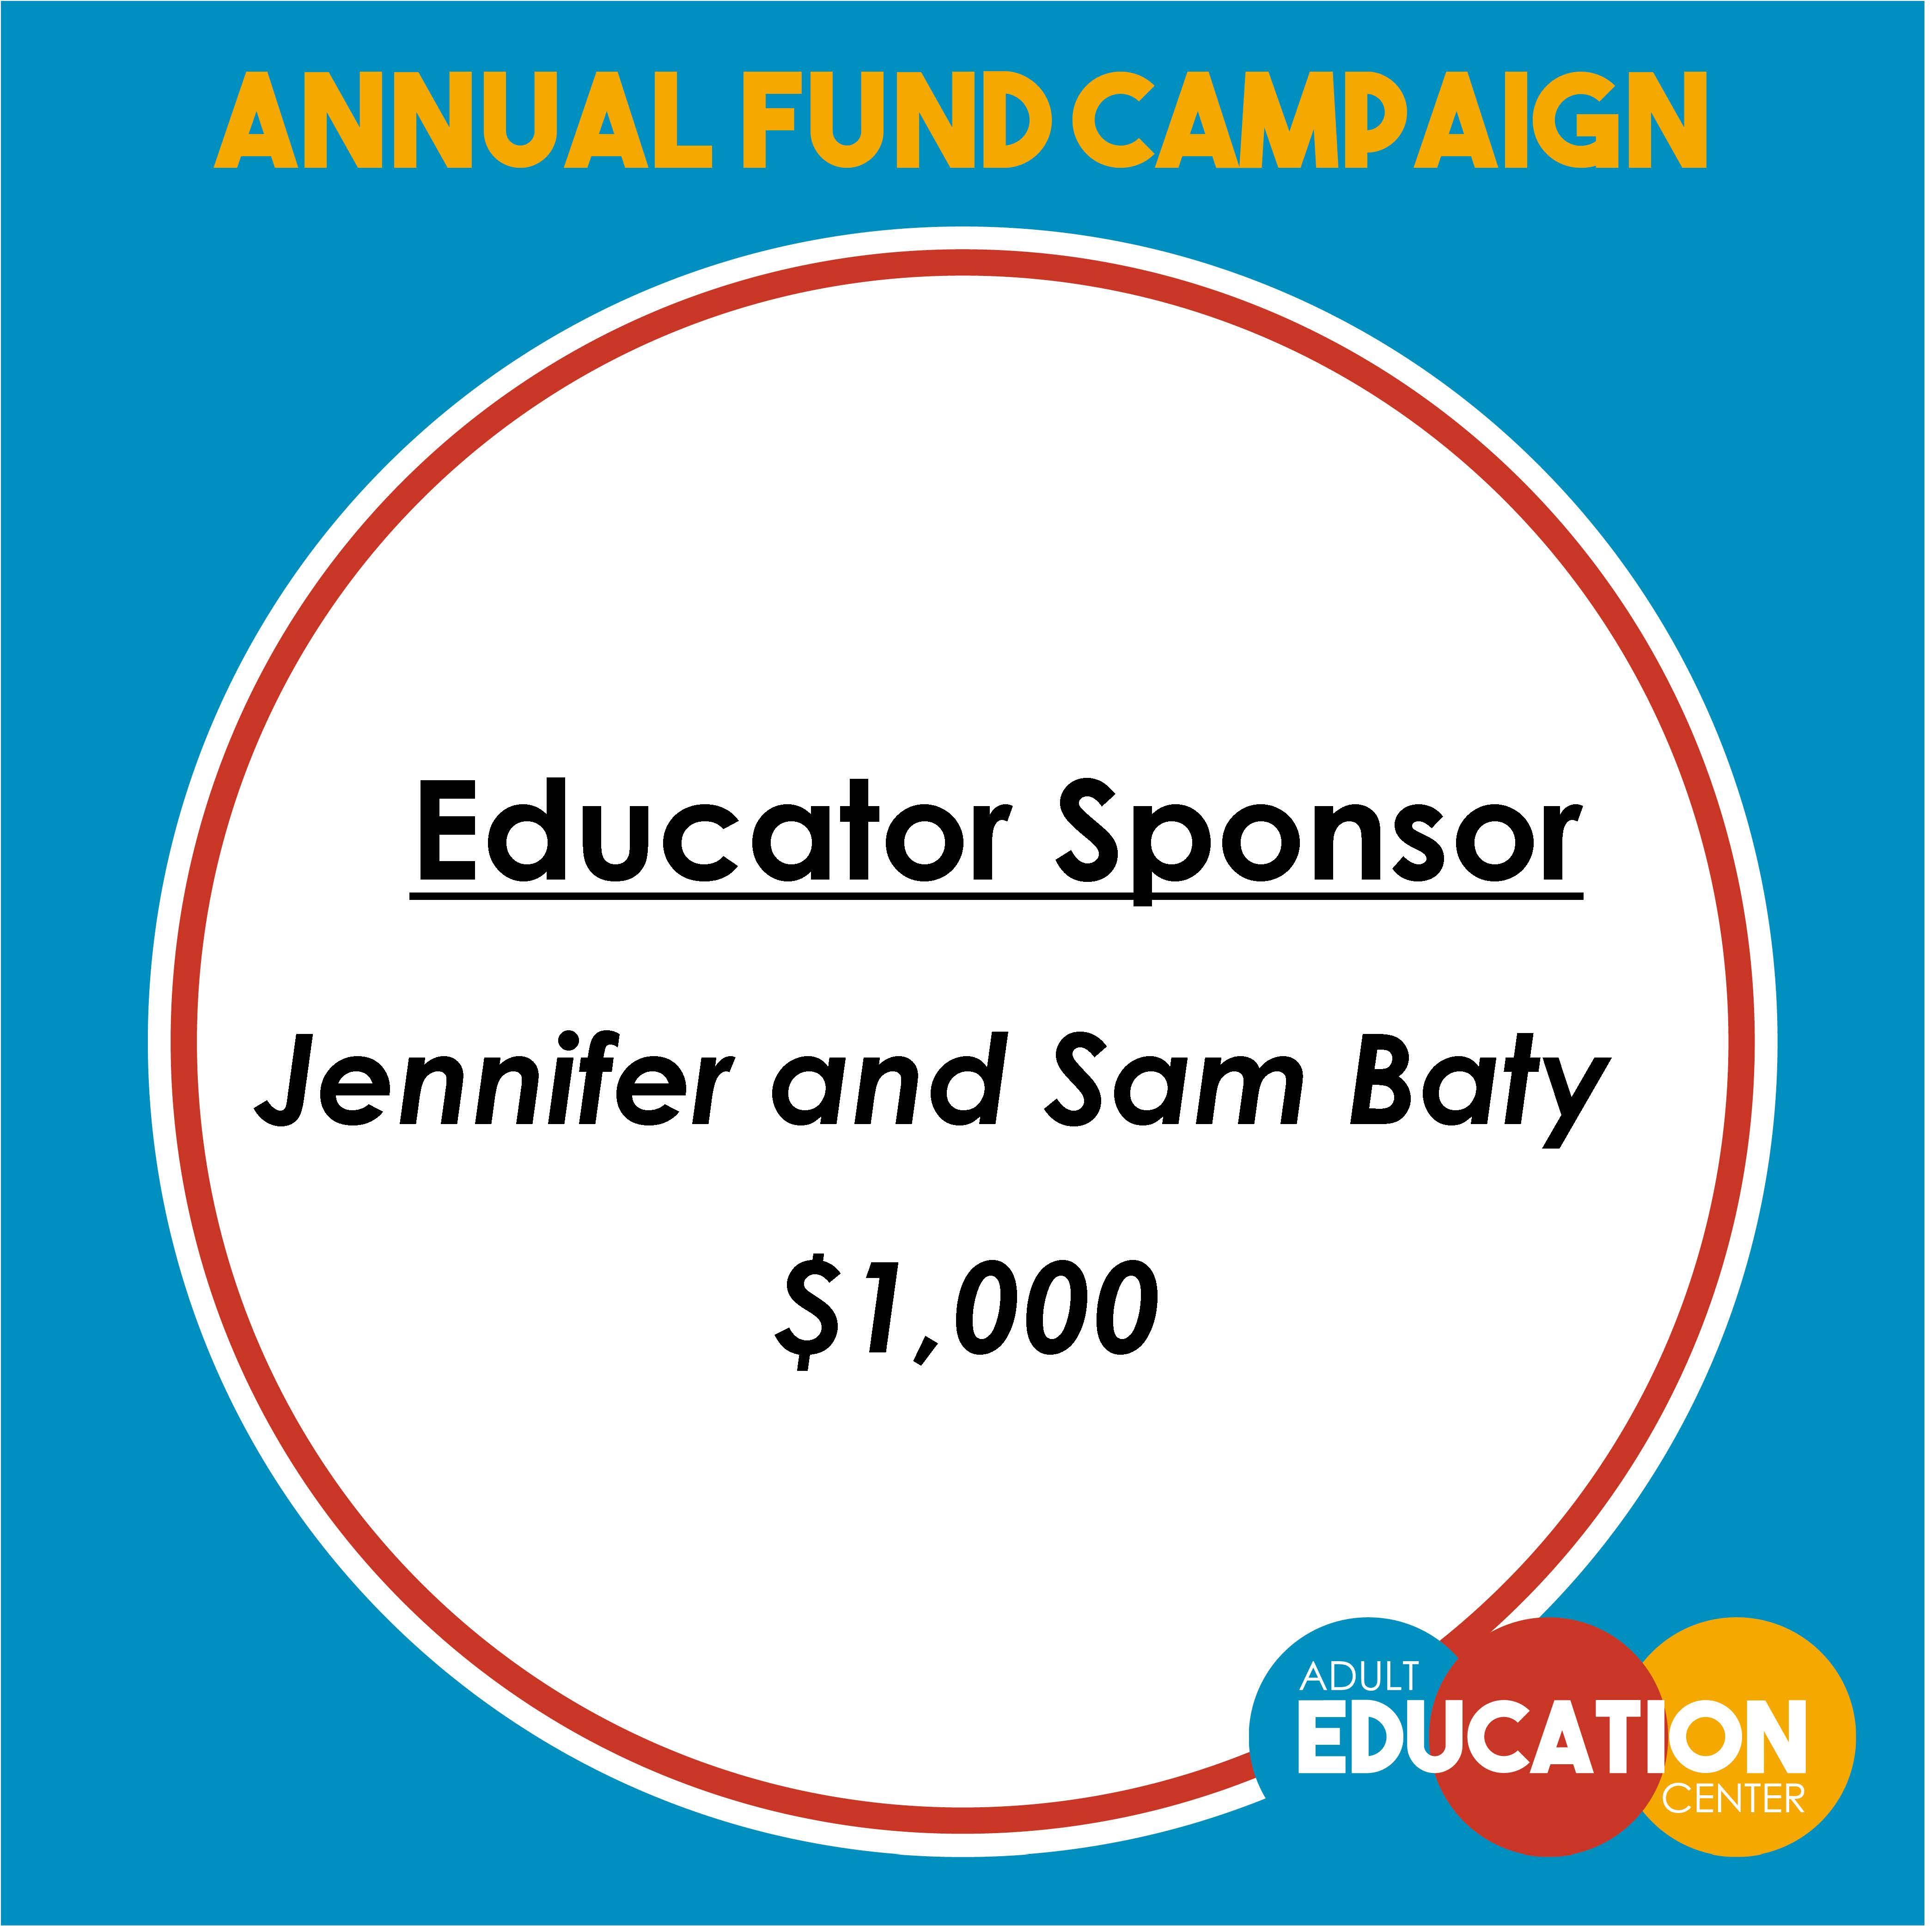 Jennifer and Sam Baty - Educator Sponsor - $1,000